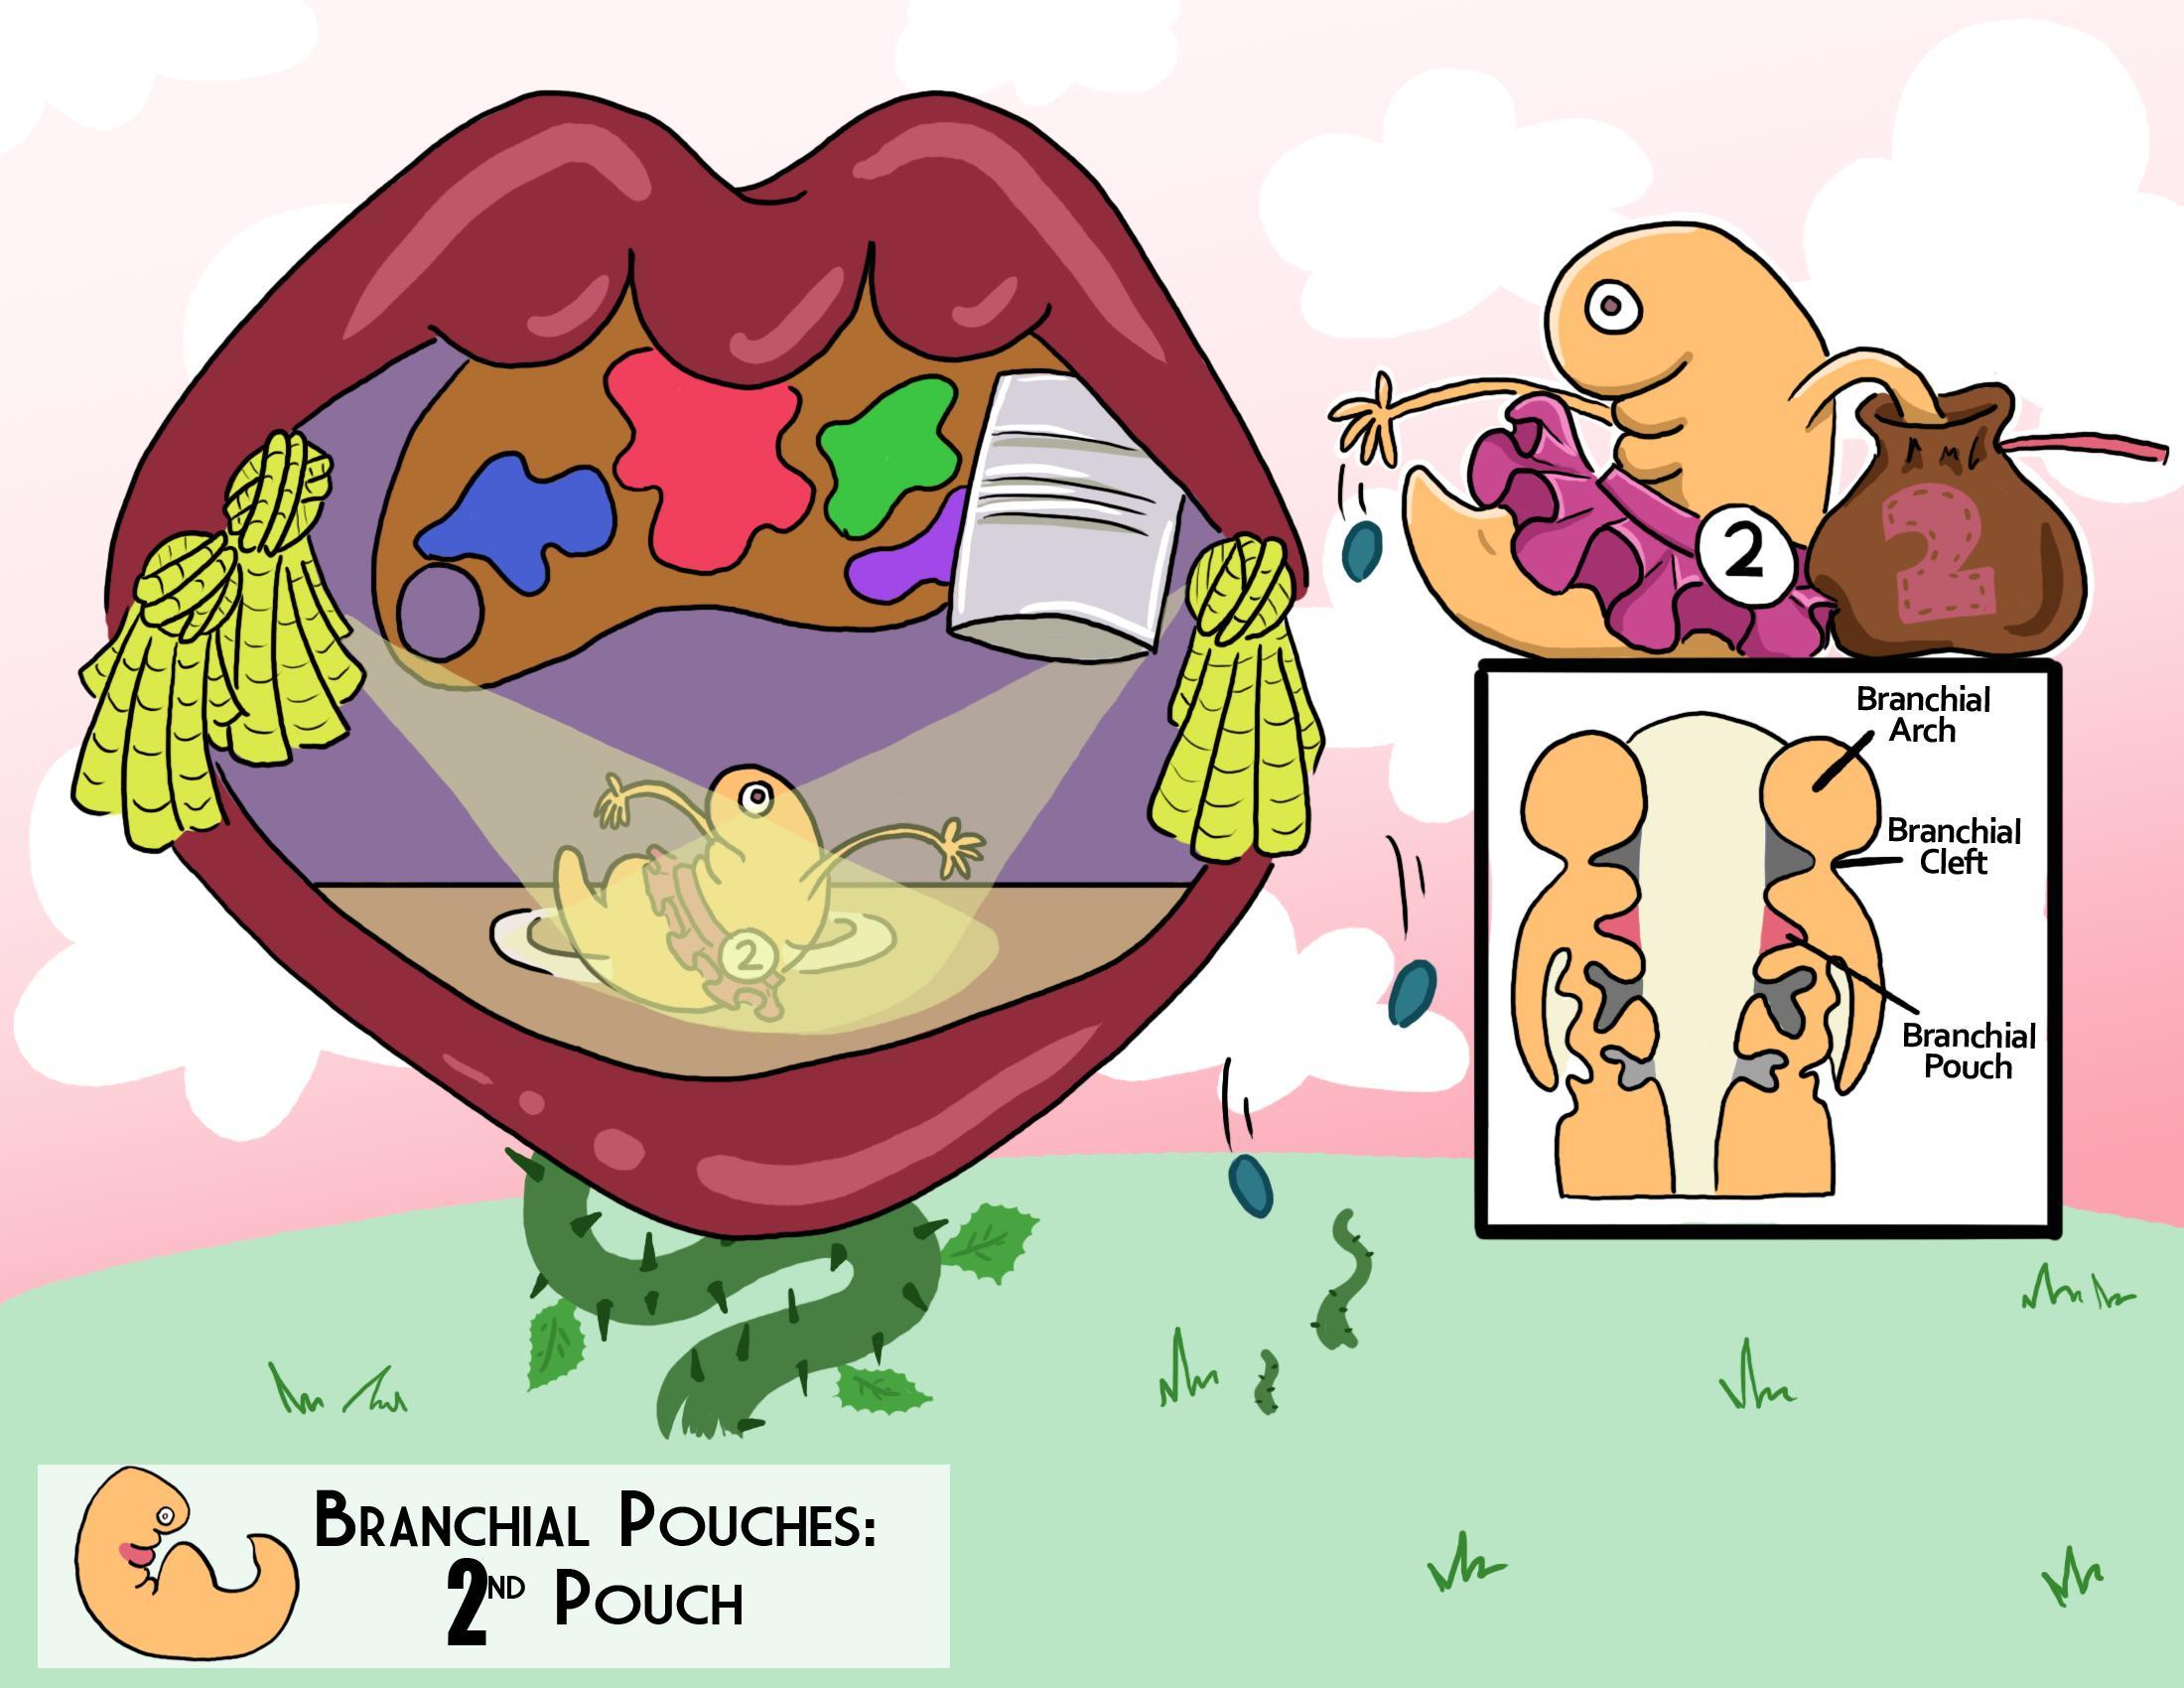 Branchial Pouches: 2nd Pouch